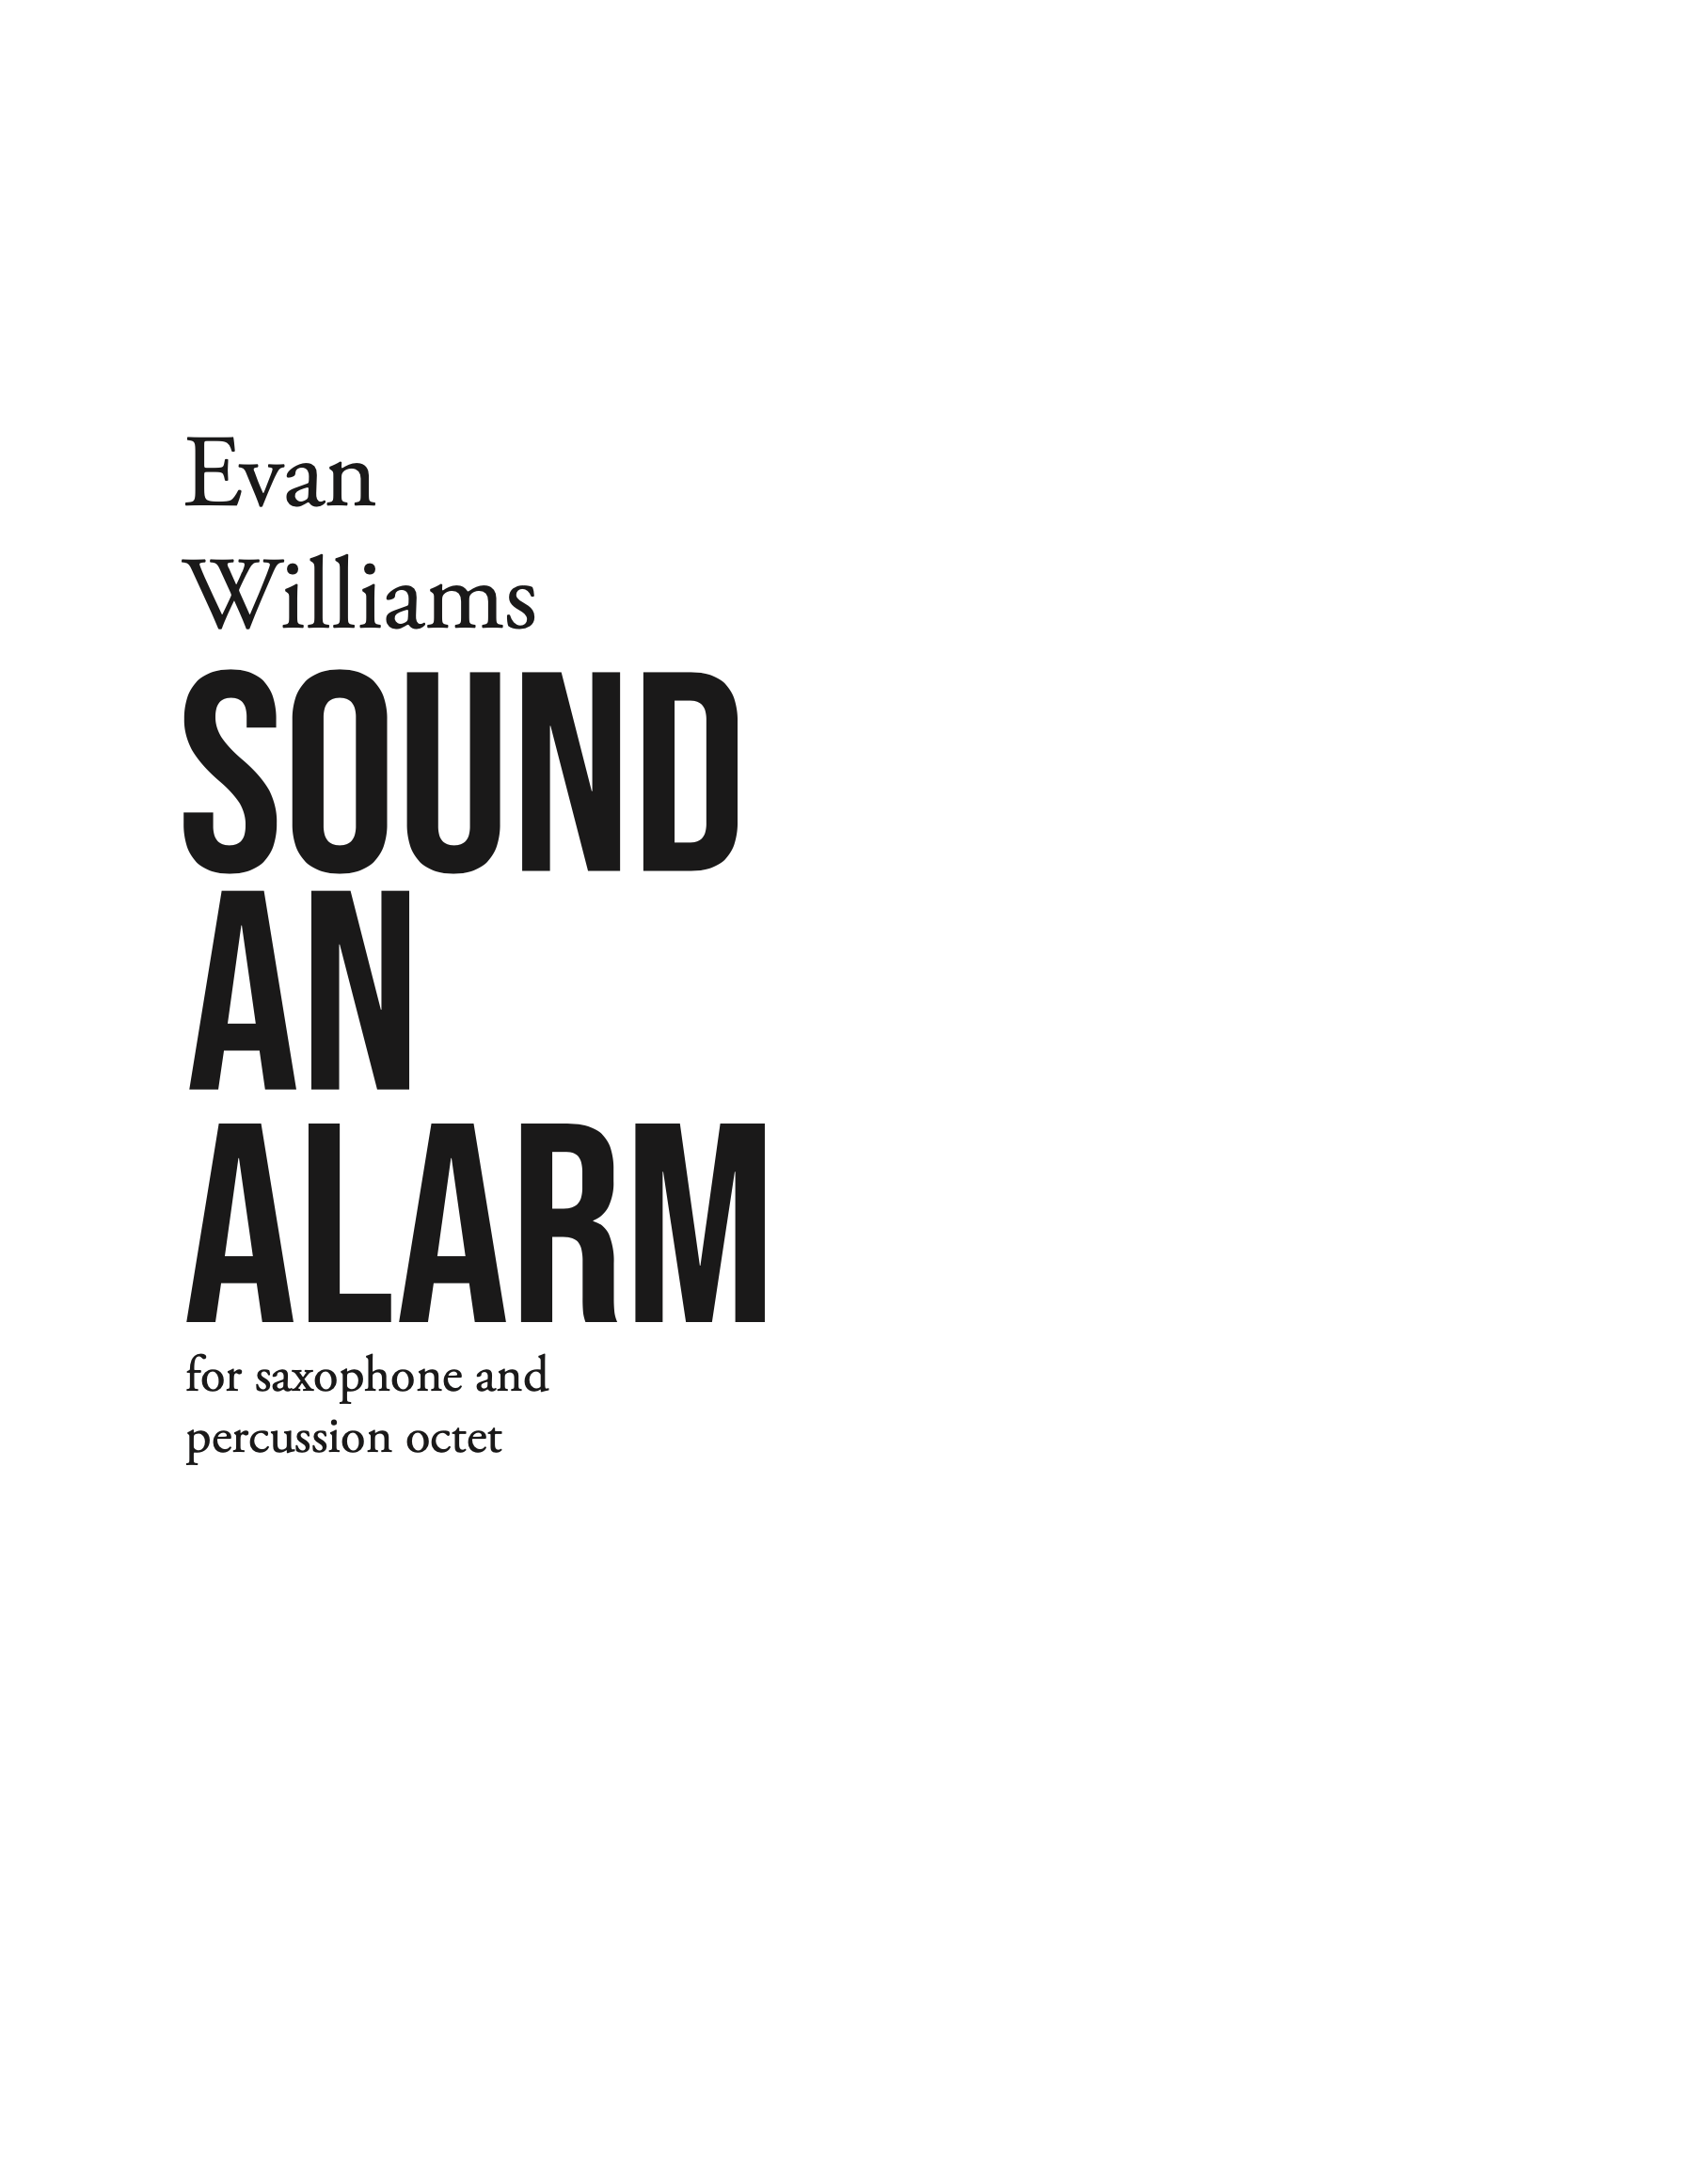 Sound An Alarm by Evan Williams